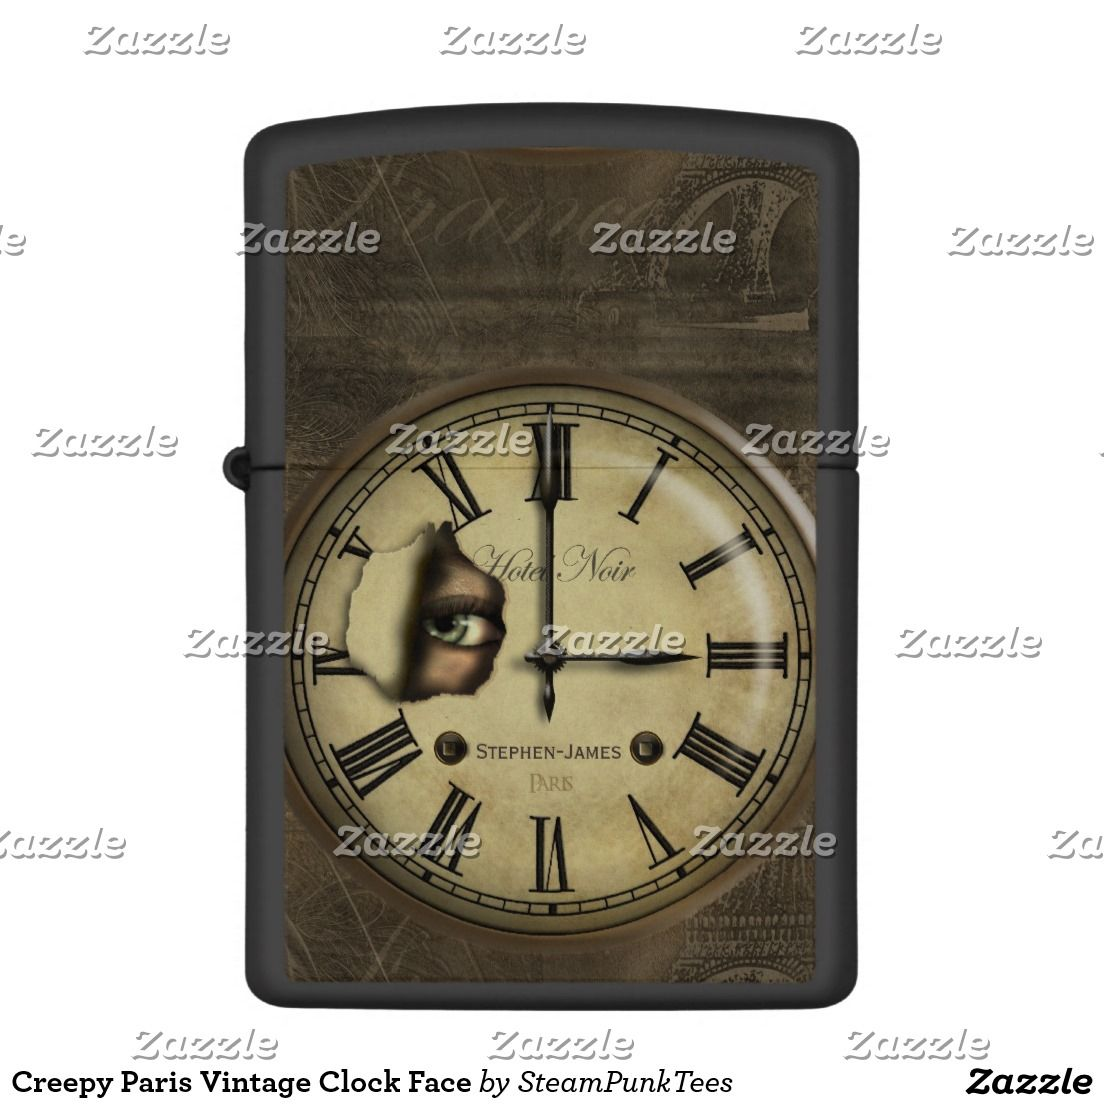 Creepy Paris Vintage Clock Face Zippo Lighter Zazzle Com Zippo Lighter Vintage Clock Zippo